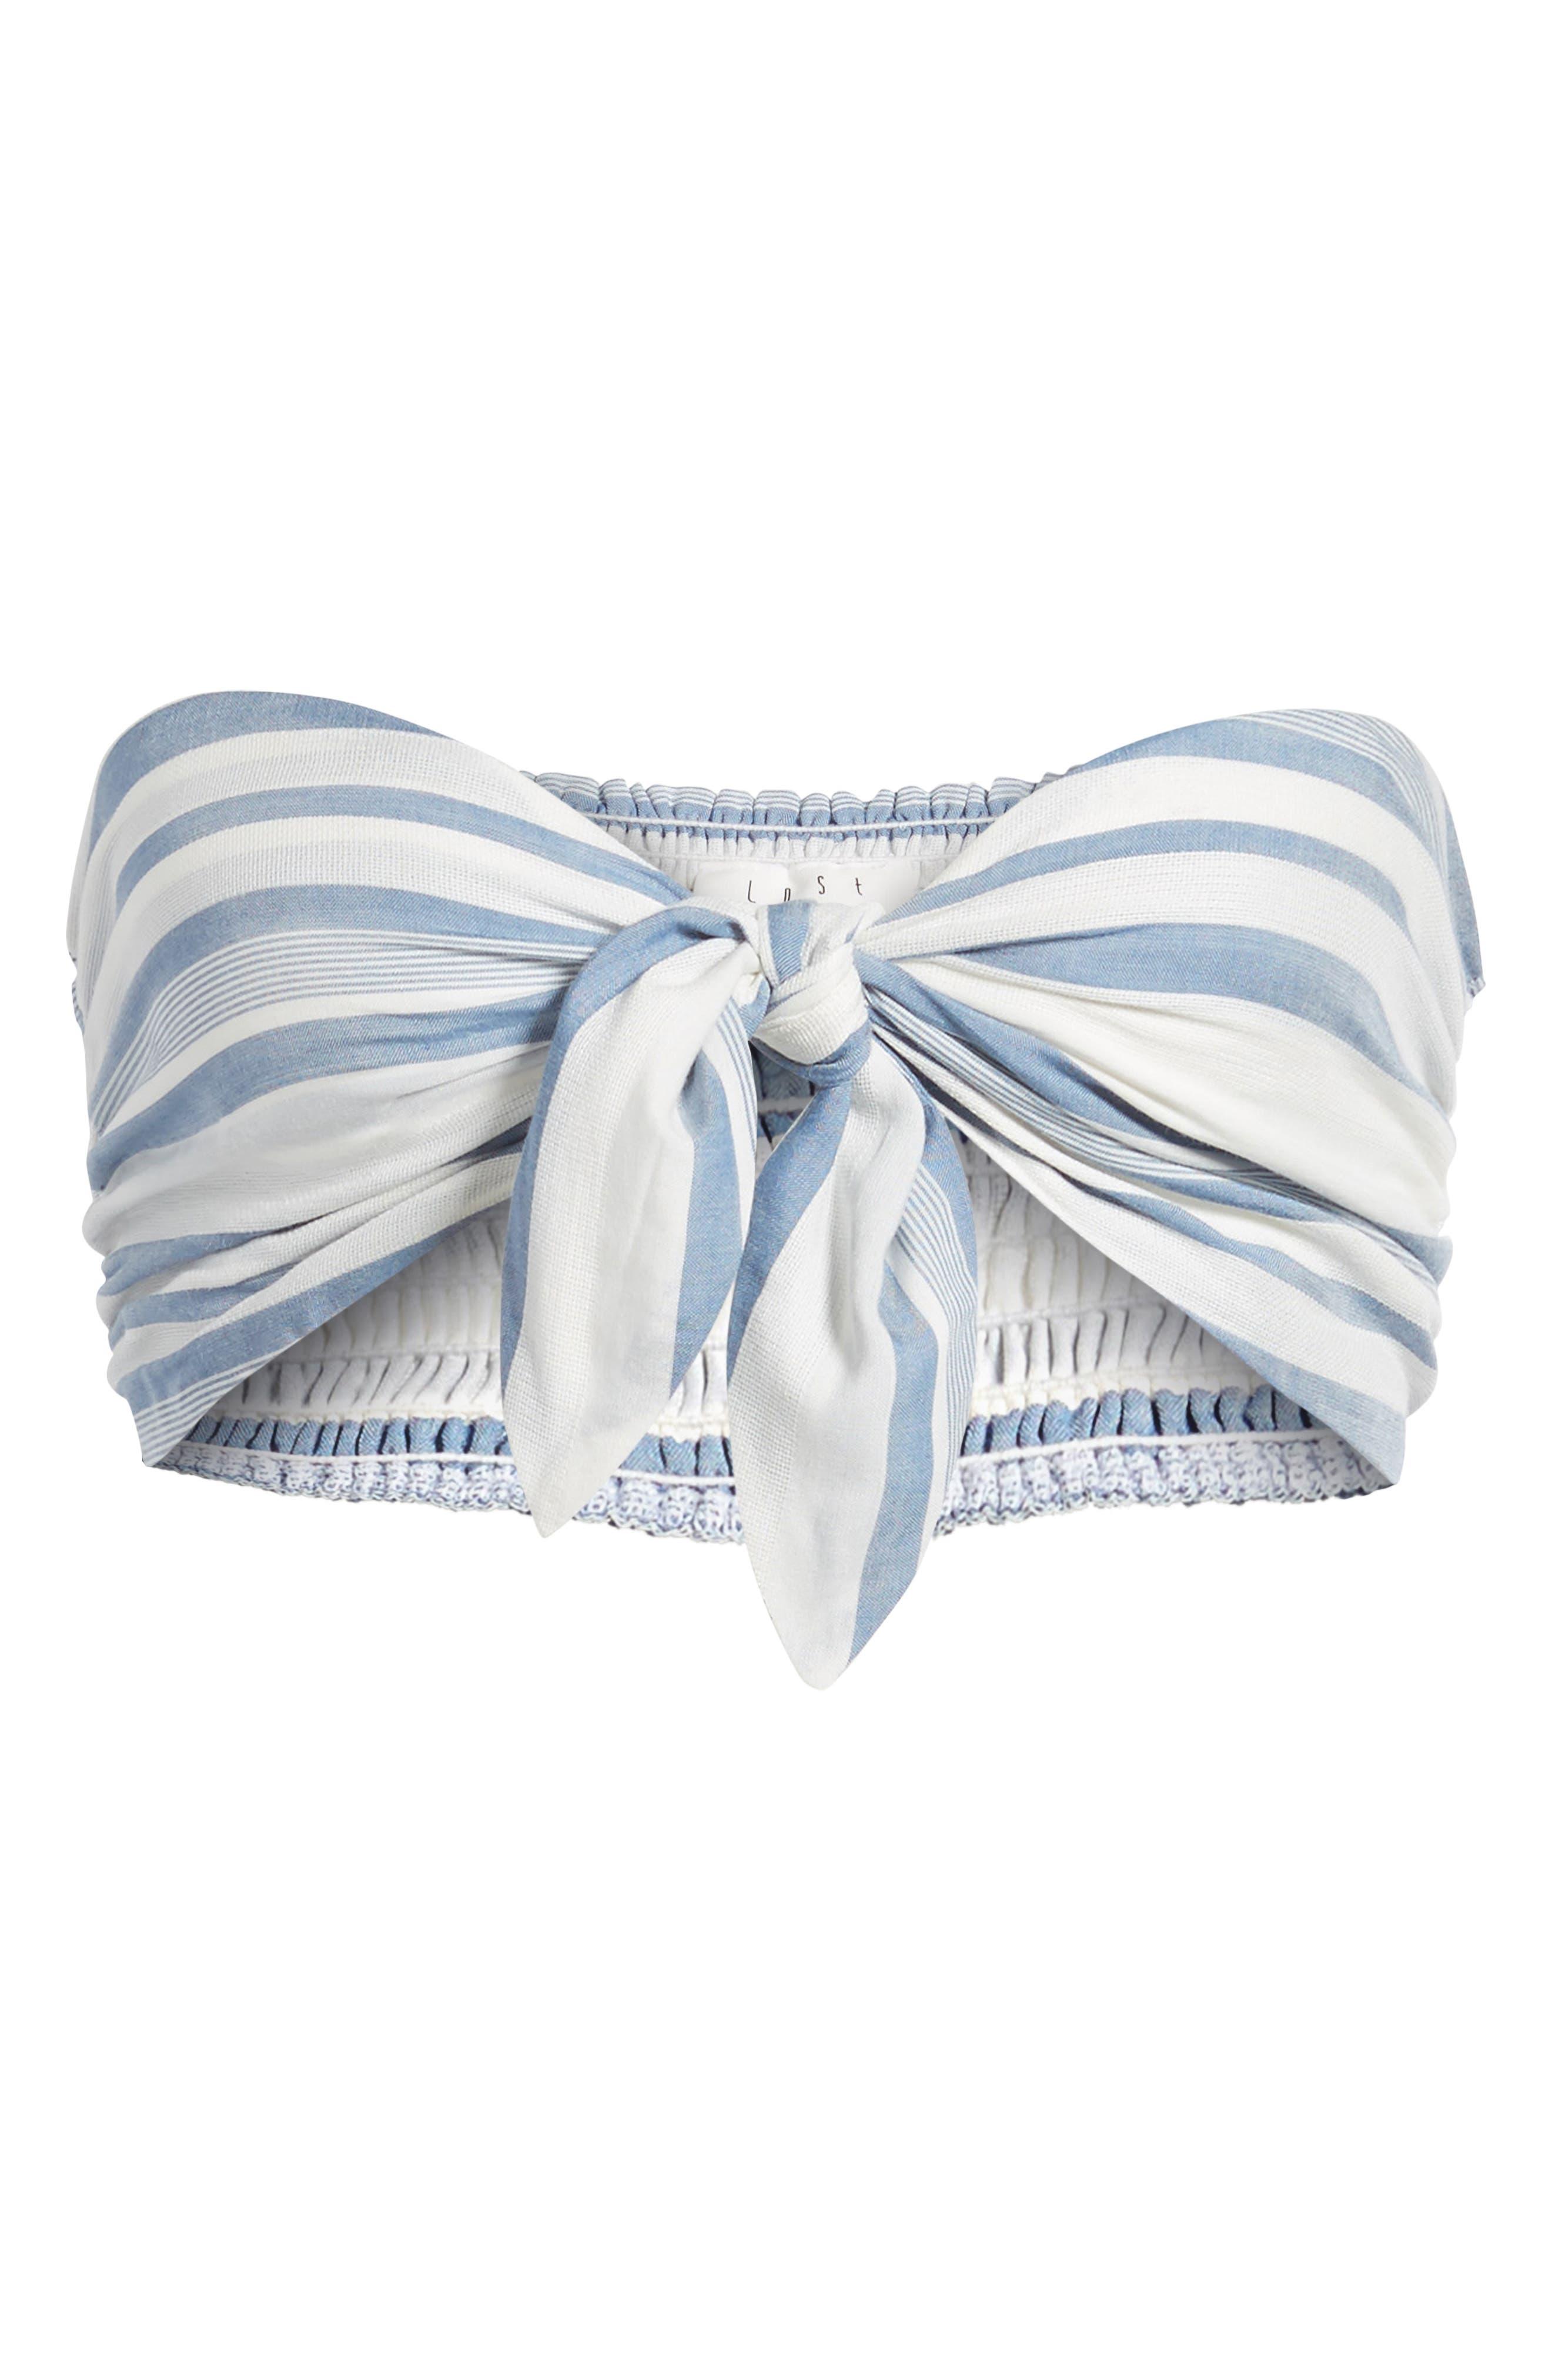 Marina Bandeau Top,                             Alternate thumbnail 7, color,                             White/ Blue